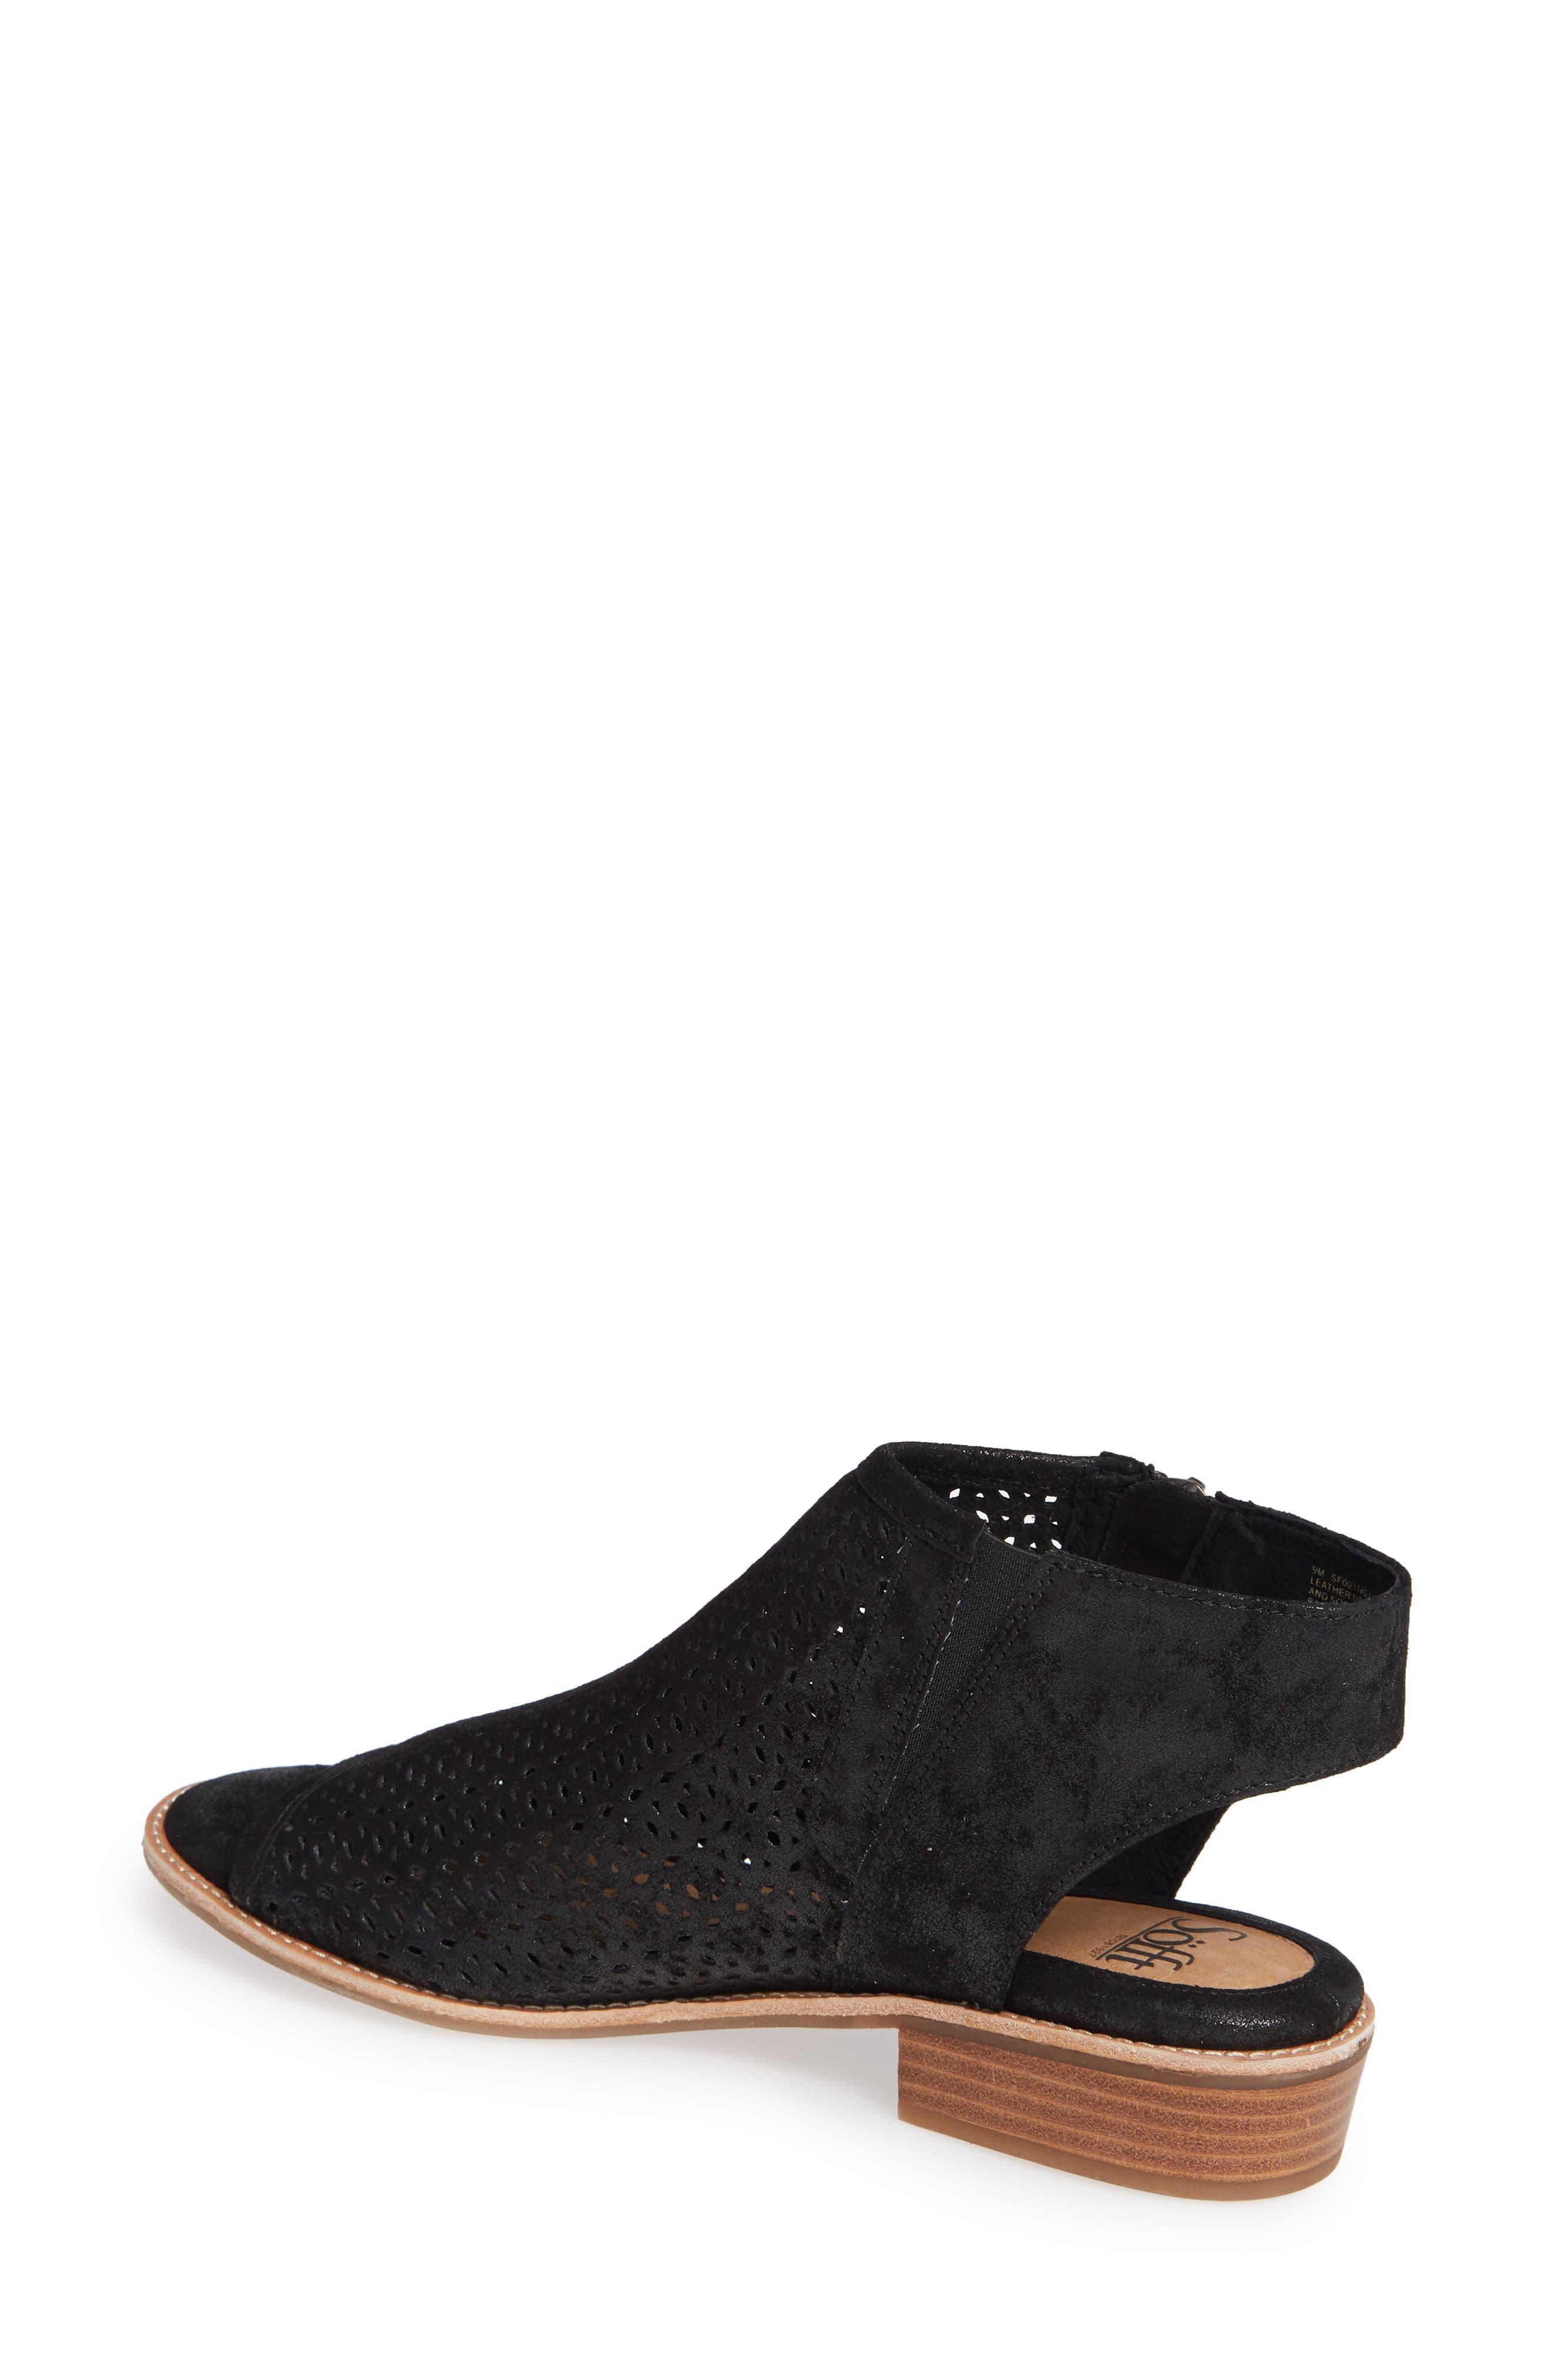 Natesa Perforated Sandal,                             Alternate thumbnail 2, color,                             BLACK SUEDE